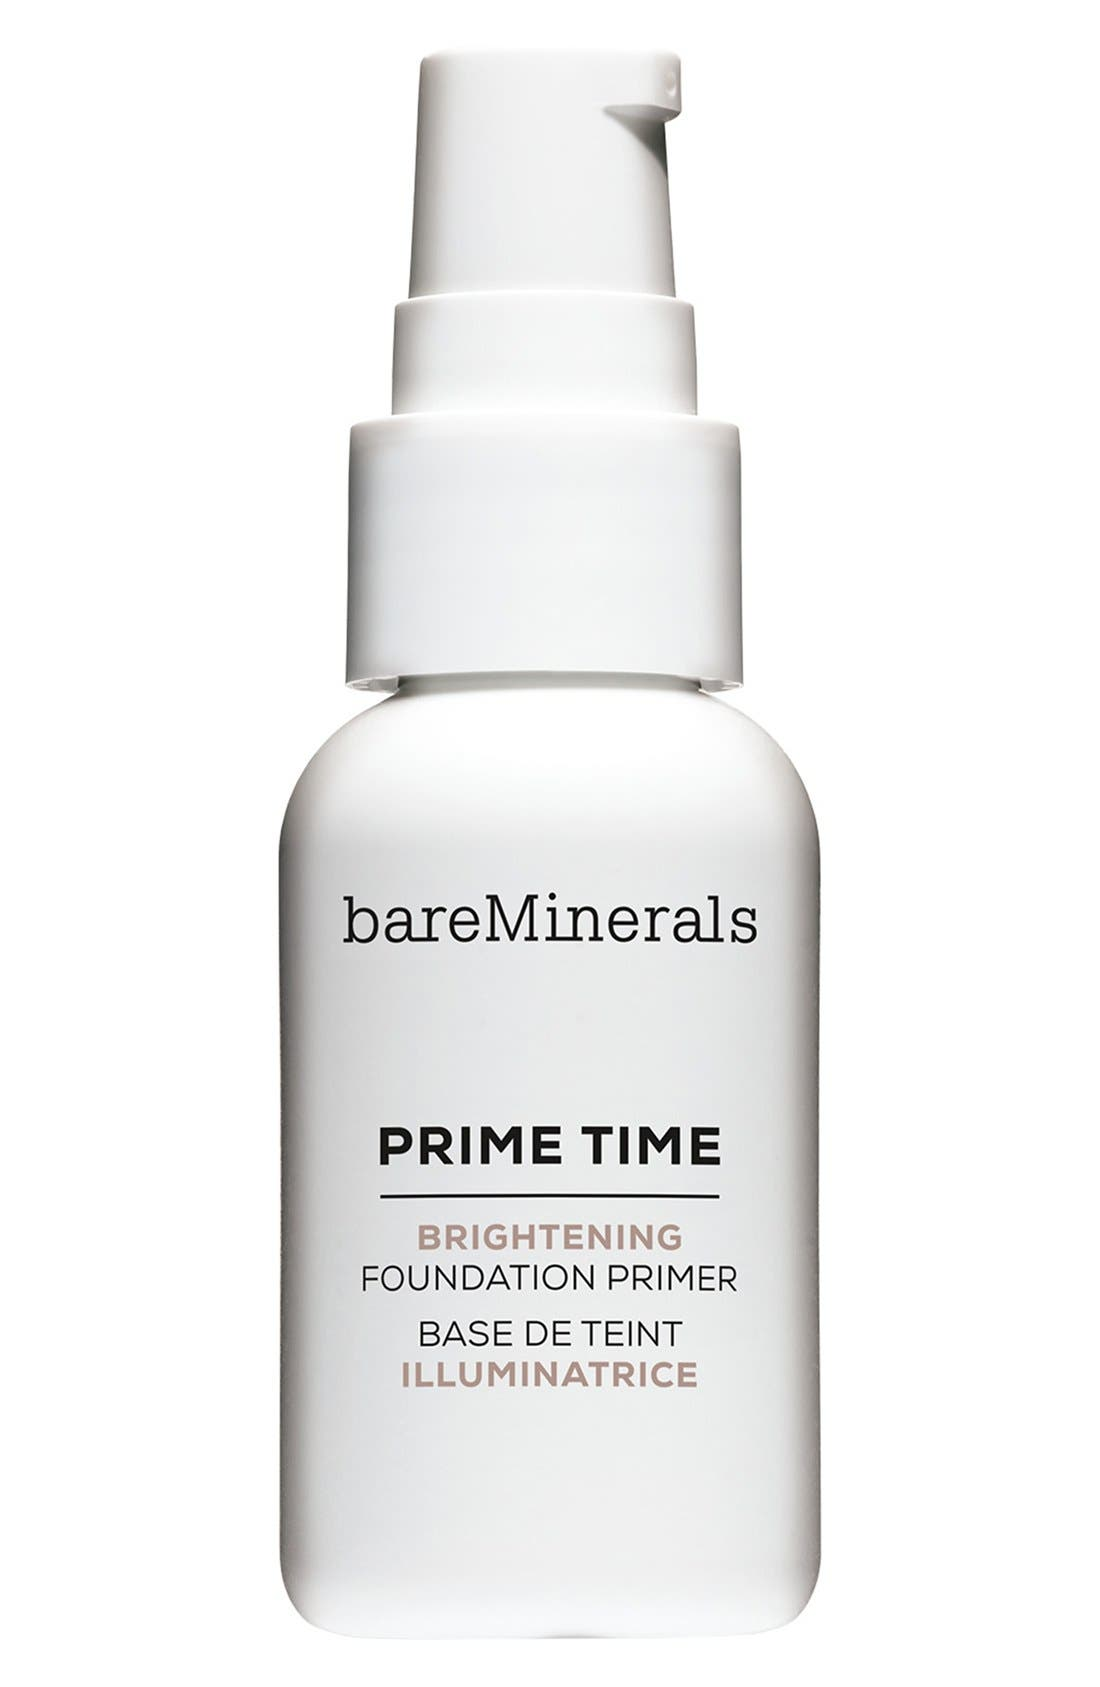 bareMinerals® Prime Time Brightening Foundation Primer